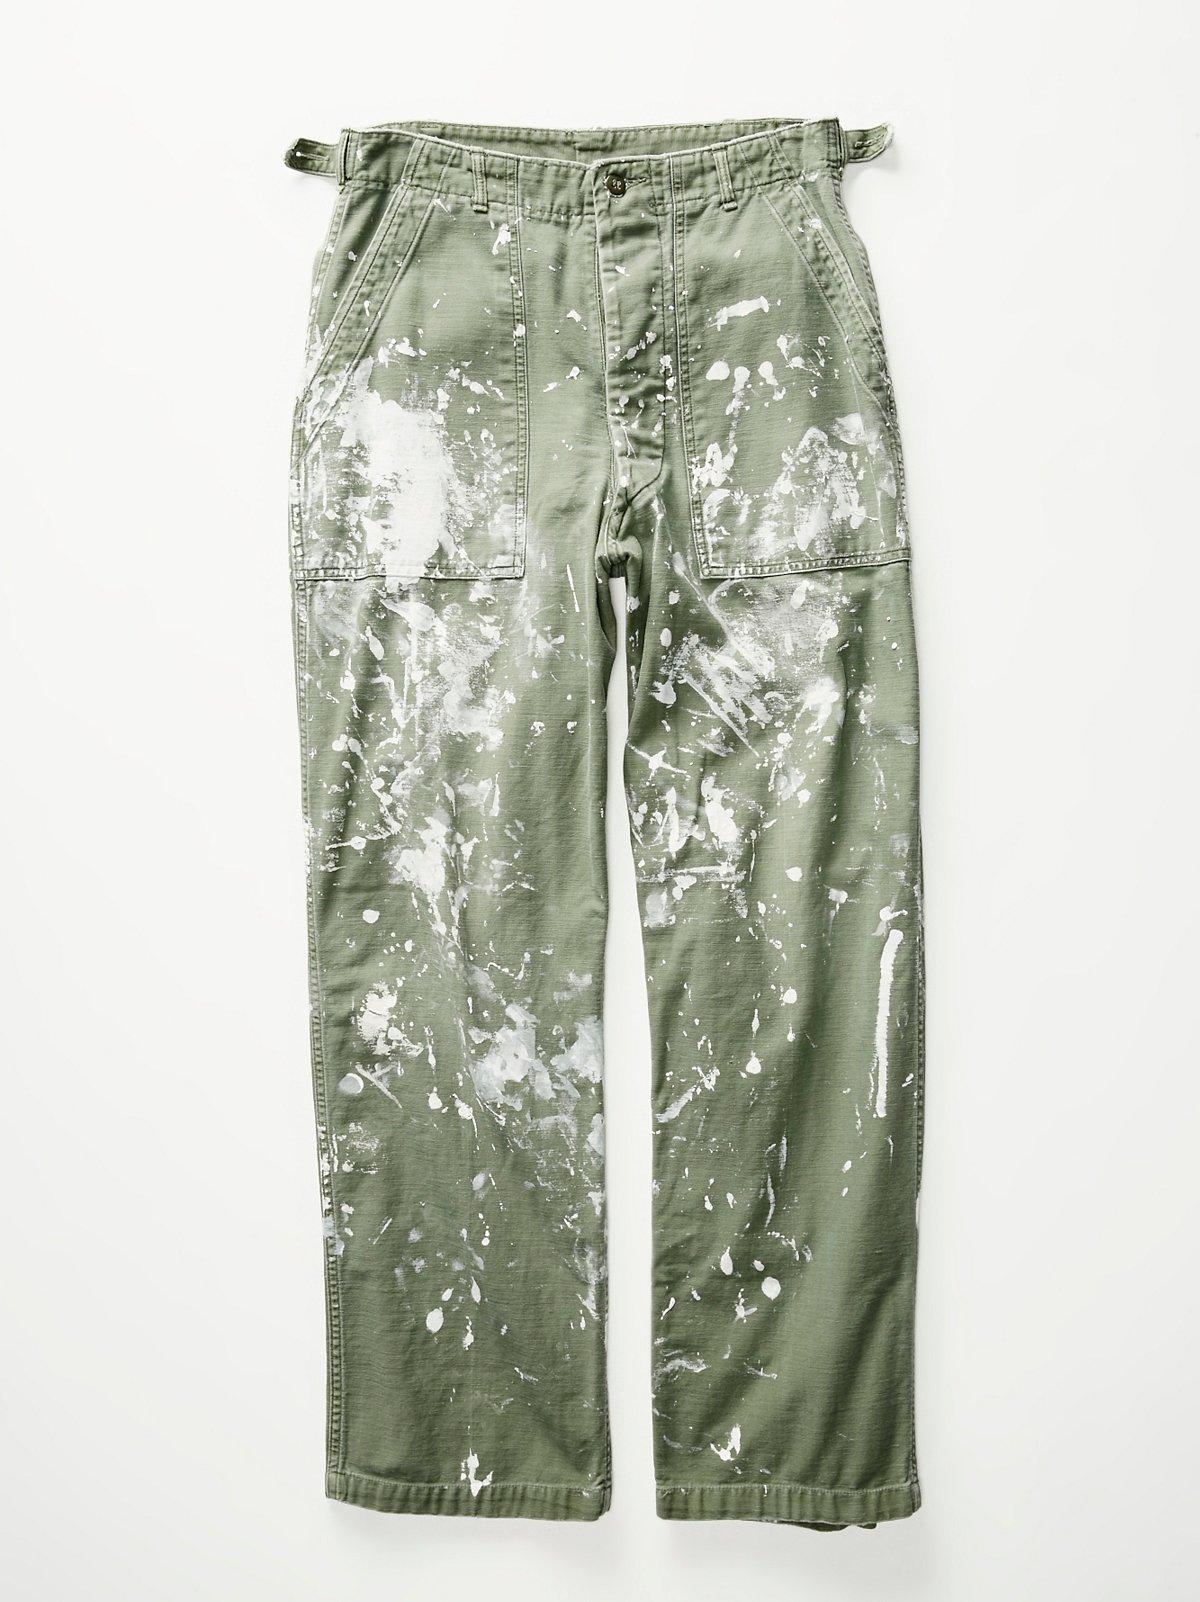 Vintage 1960s Military Pants